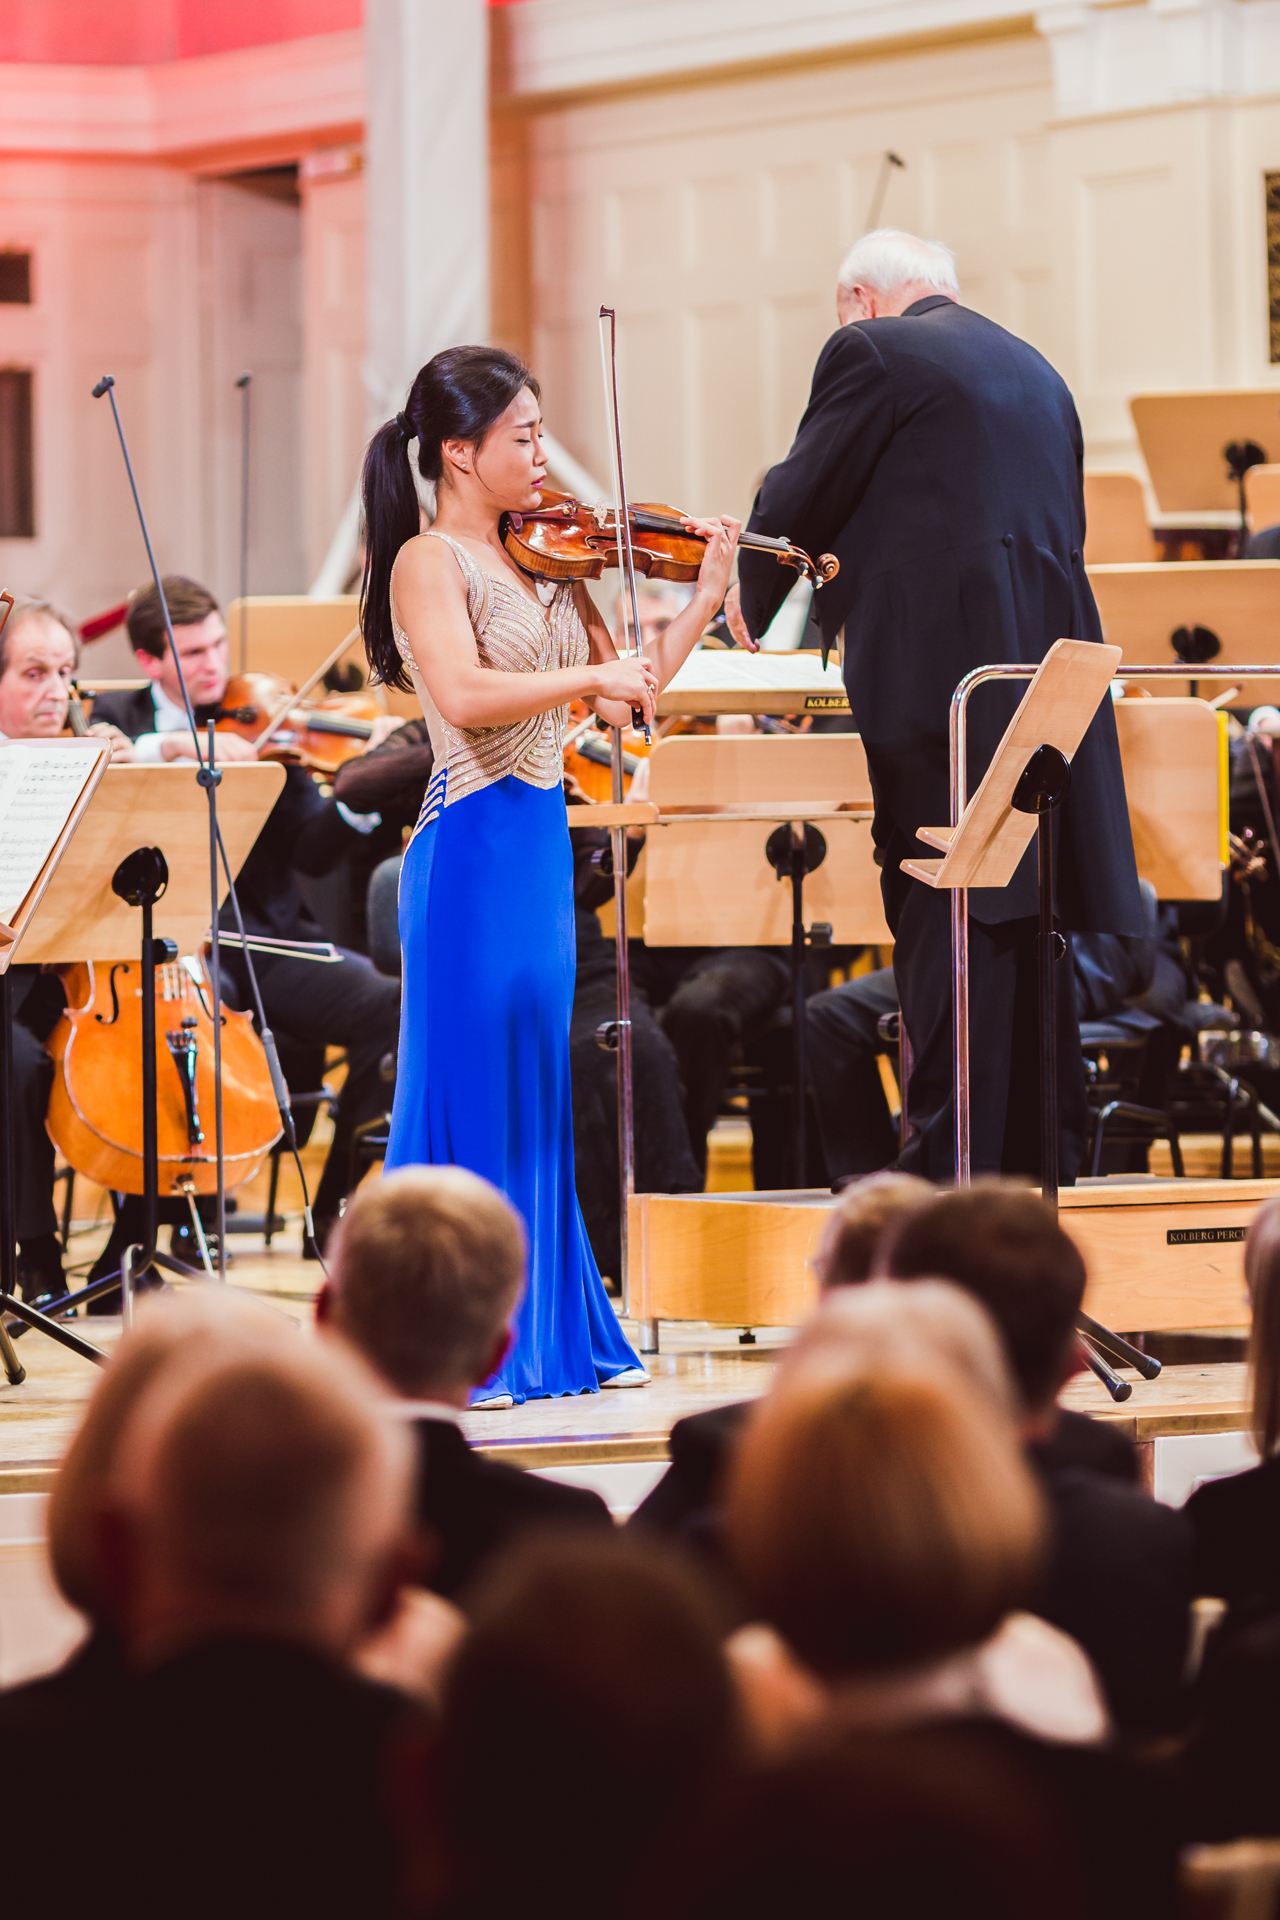 Galeria - Koncert Inauguracyjny: Soyoung Yoon - skrzypce, The Deutsche Kammerphilharmonie Bremen pod dyr. Krzysztofa Pendereckiego (8.10.2016)